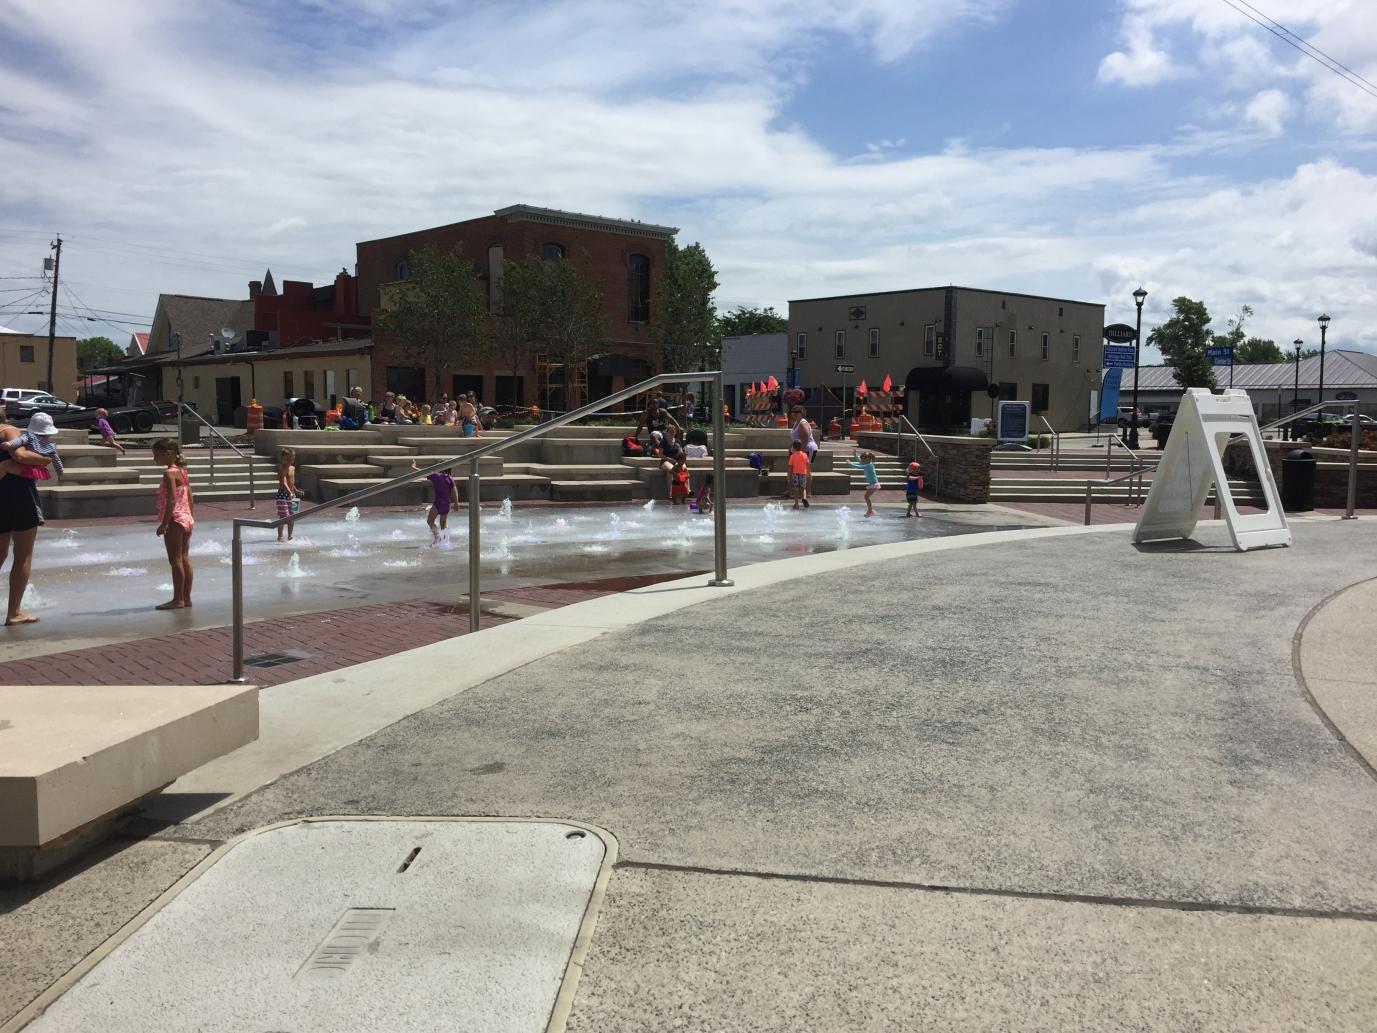 Splash pad at Hilliard's Station Park